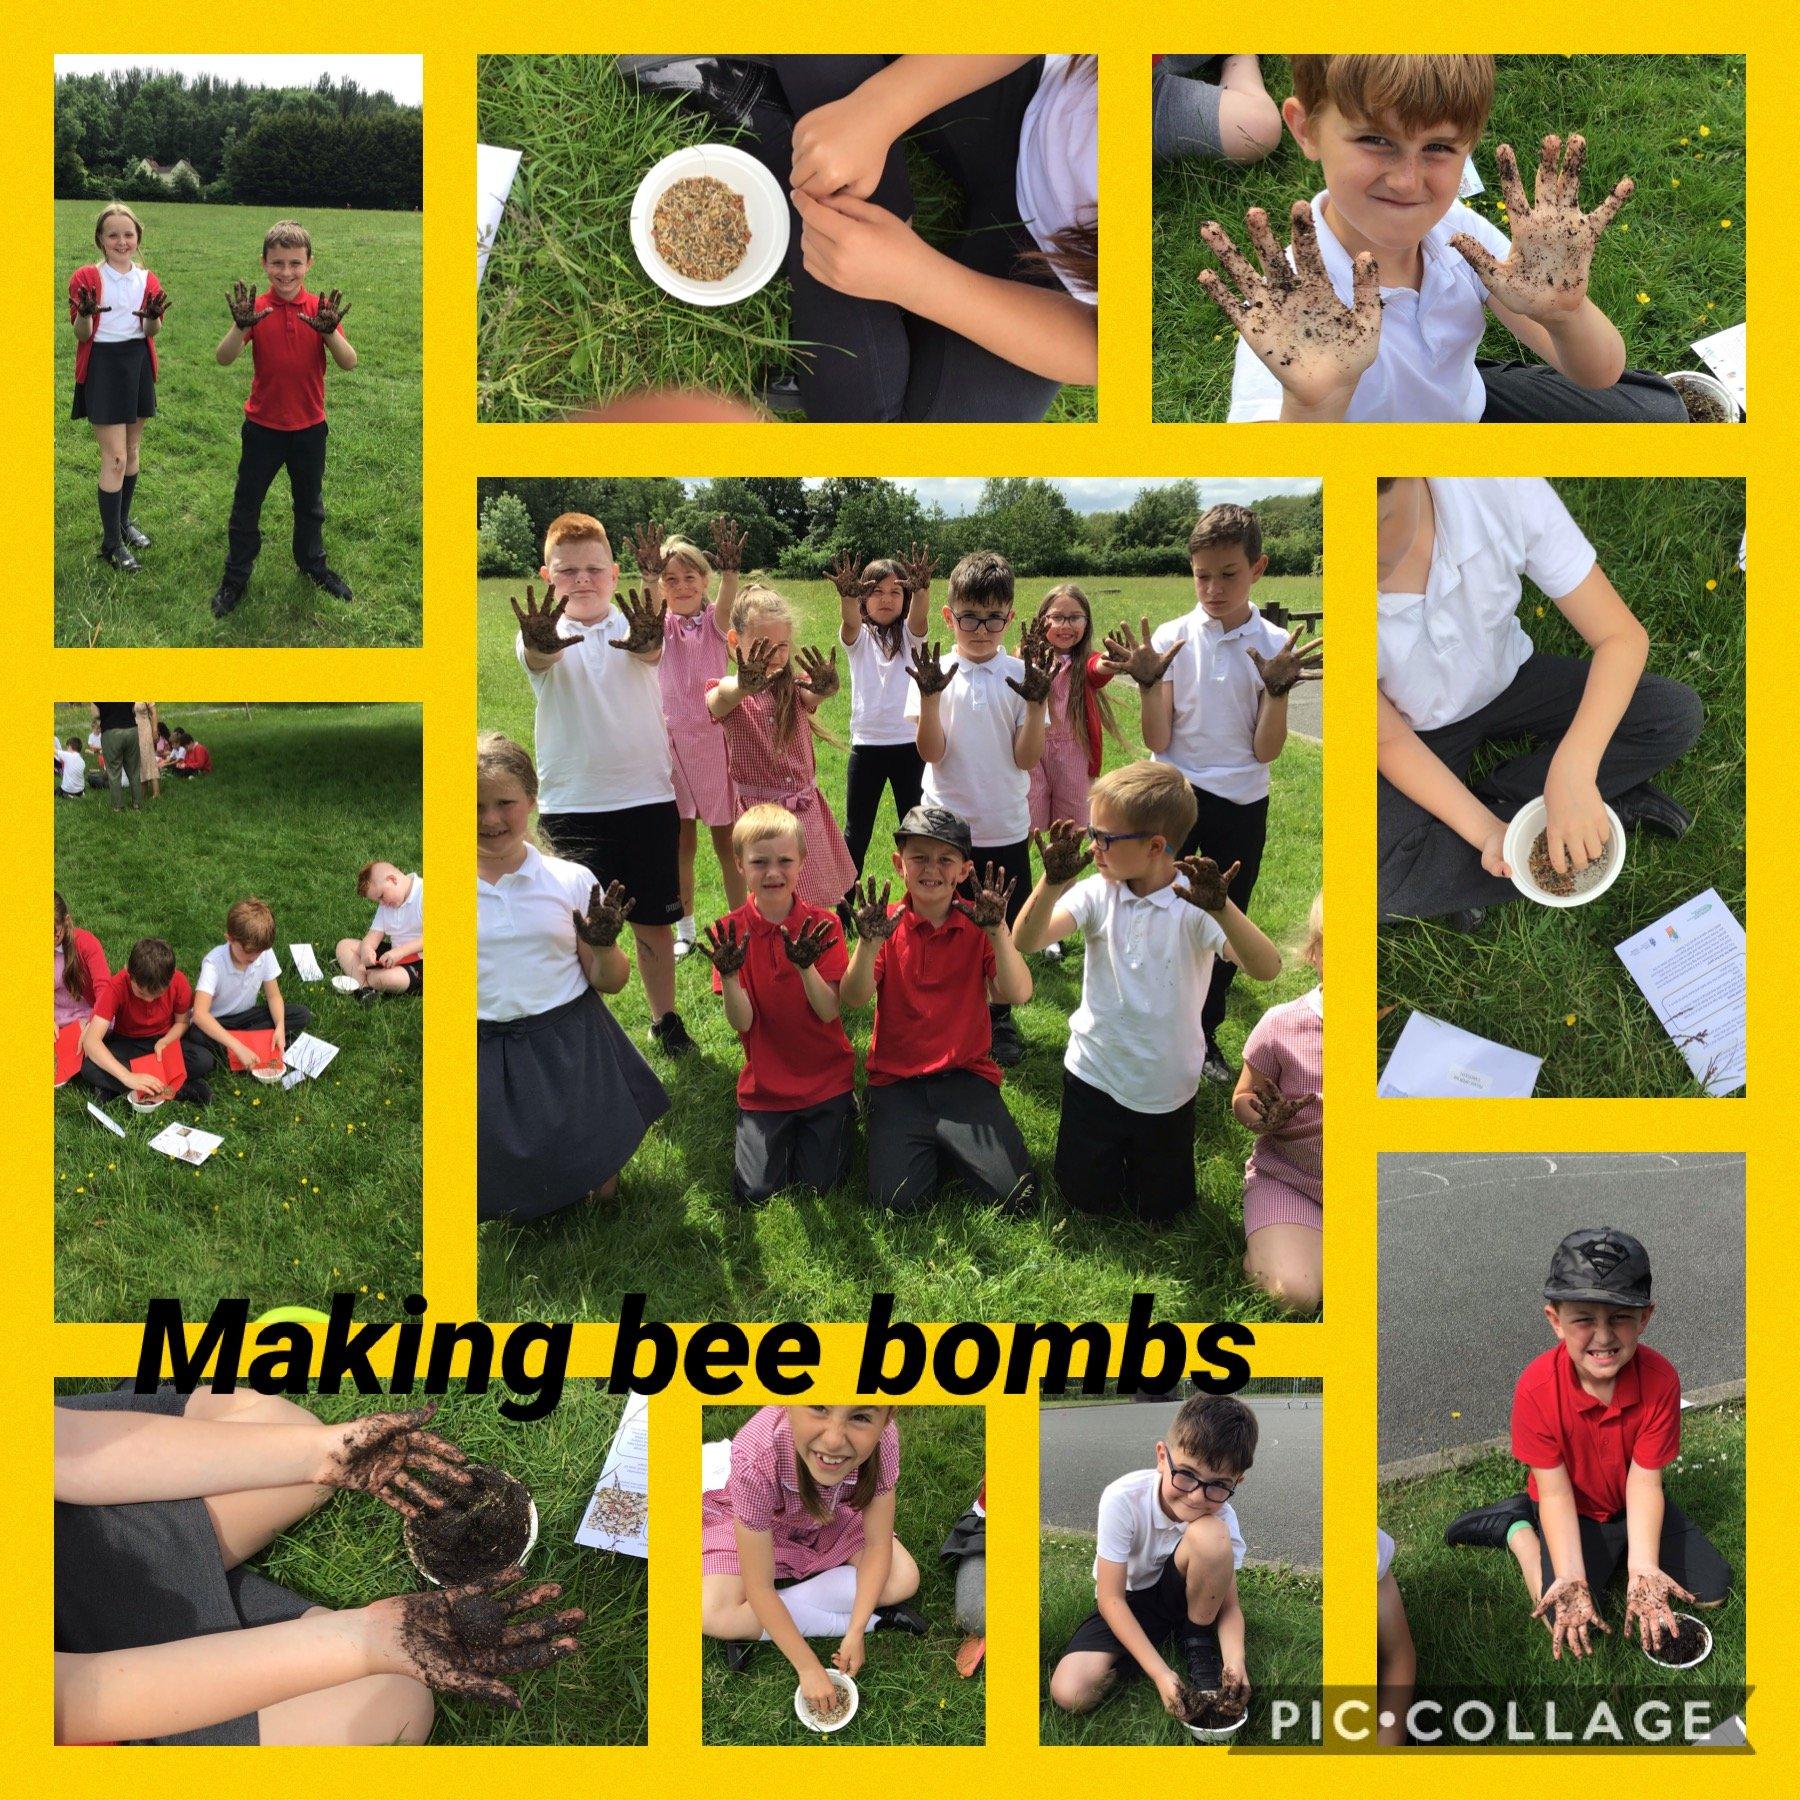 Making bee bombs